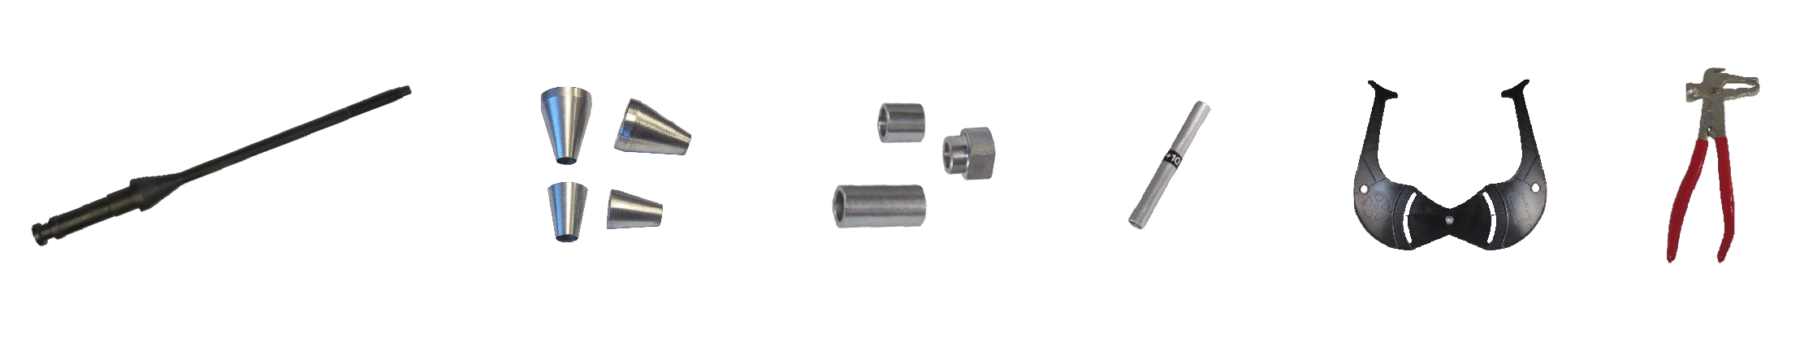 Cemb K22 Motorcycle Wheel Balancer Accessories